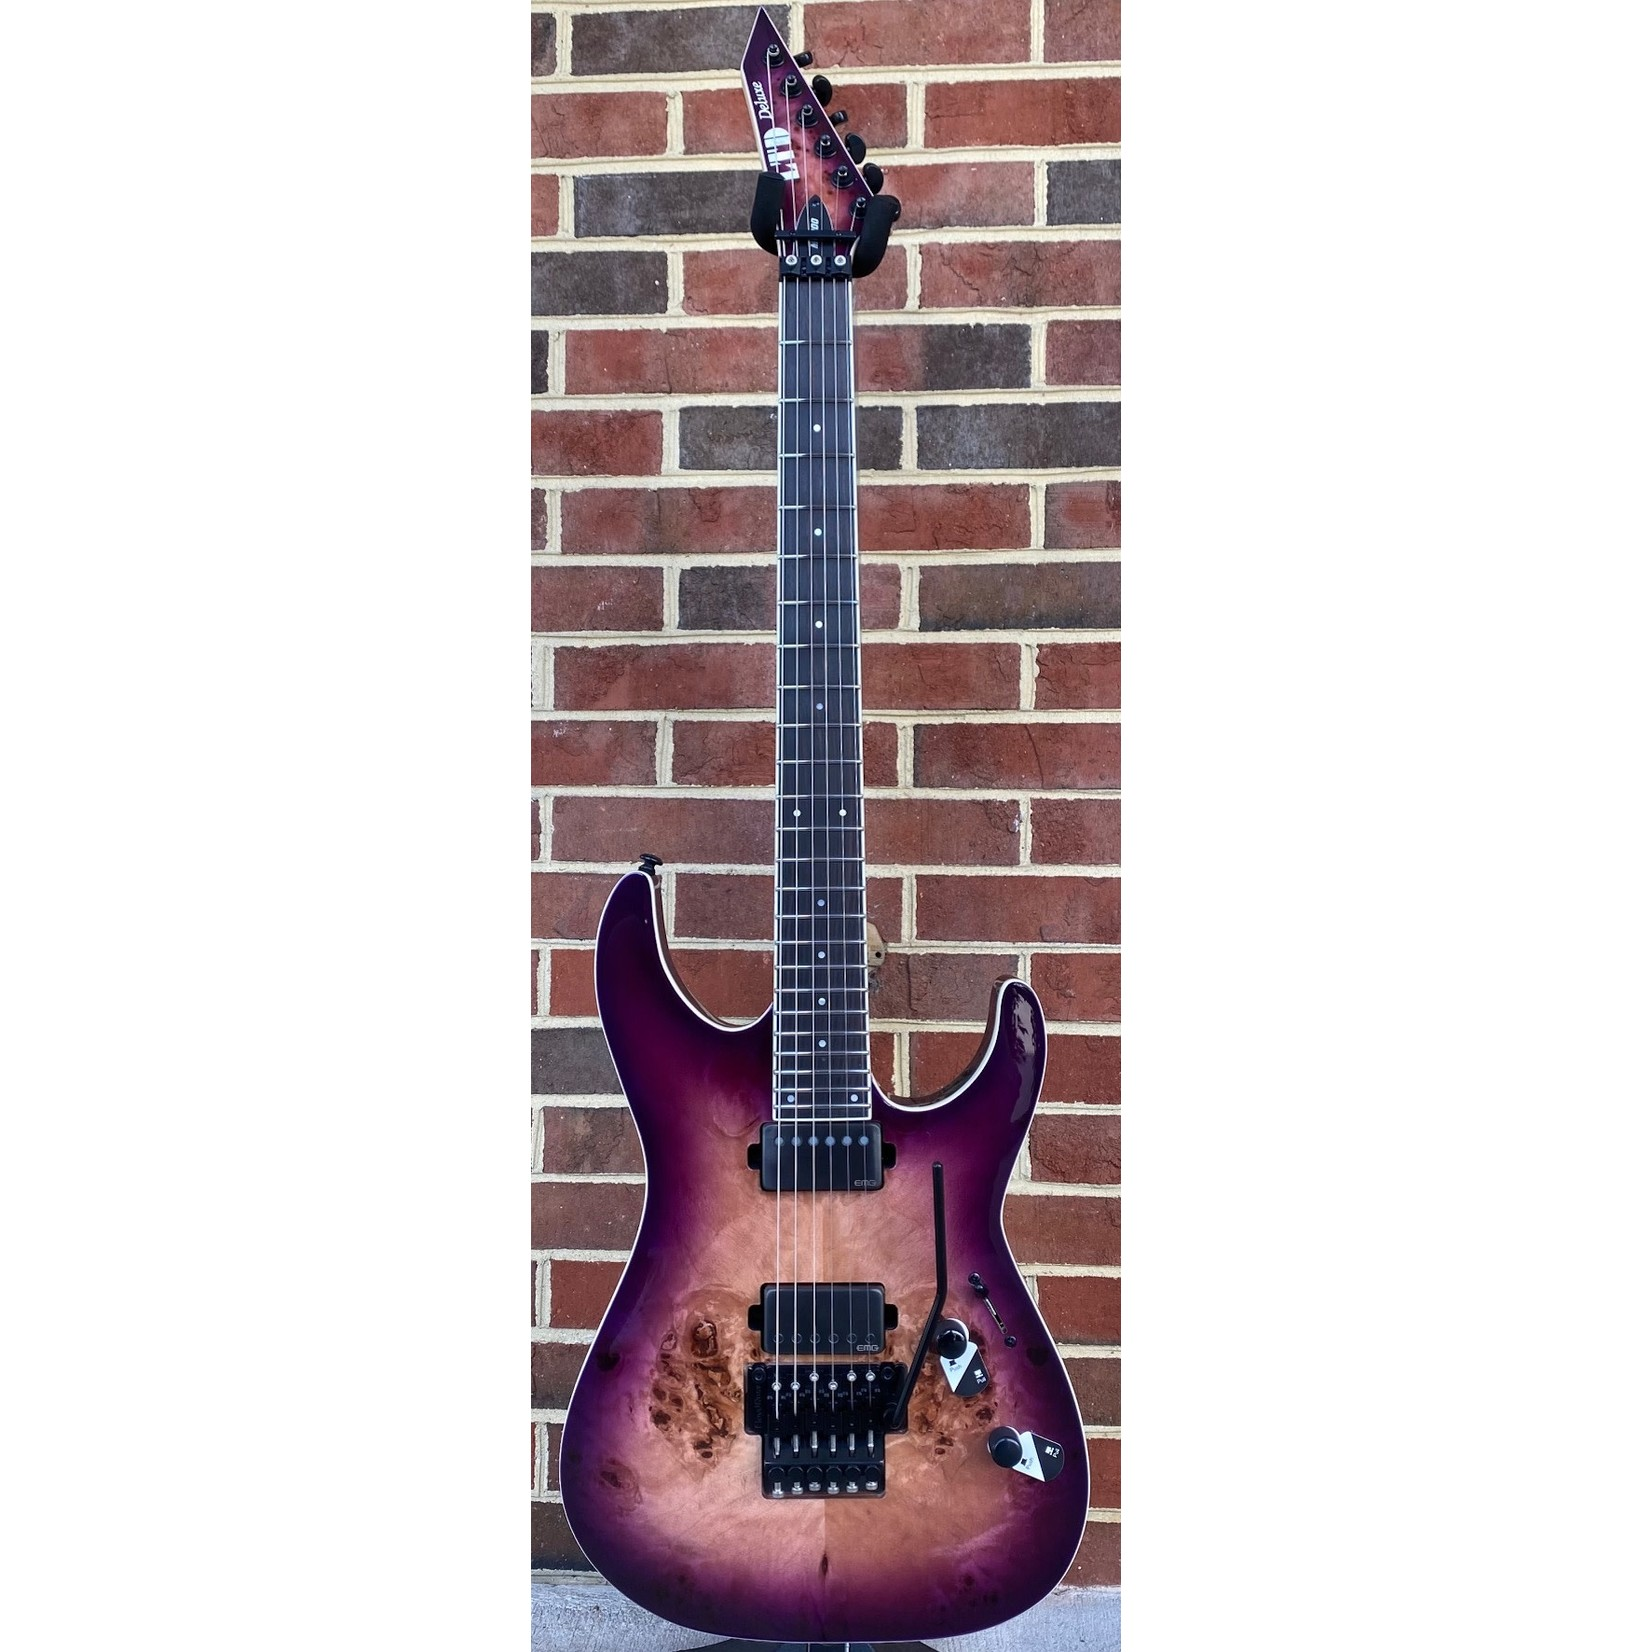 LTD ESP LTD M-1000, Purple Natural Burst, Poplar Burl Top, Floyd Rose 1000SE, EMG 57/66TW, Macassar Ebony Fretboard